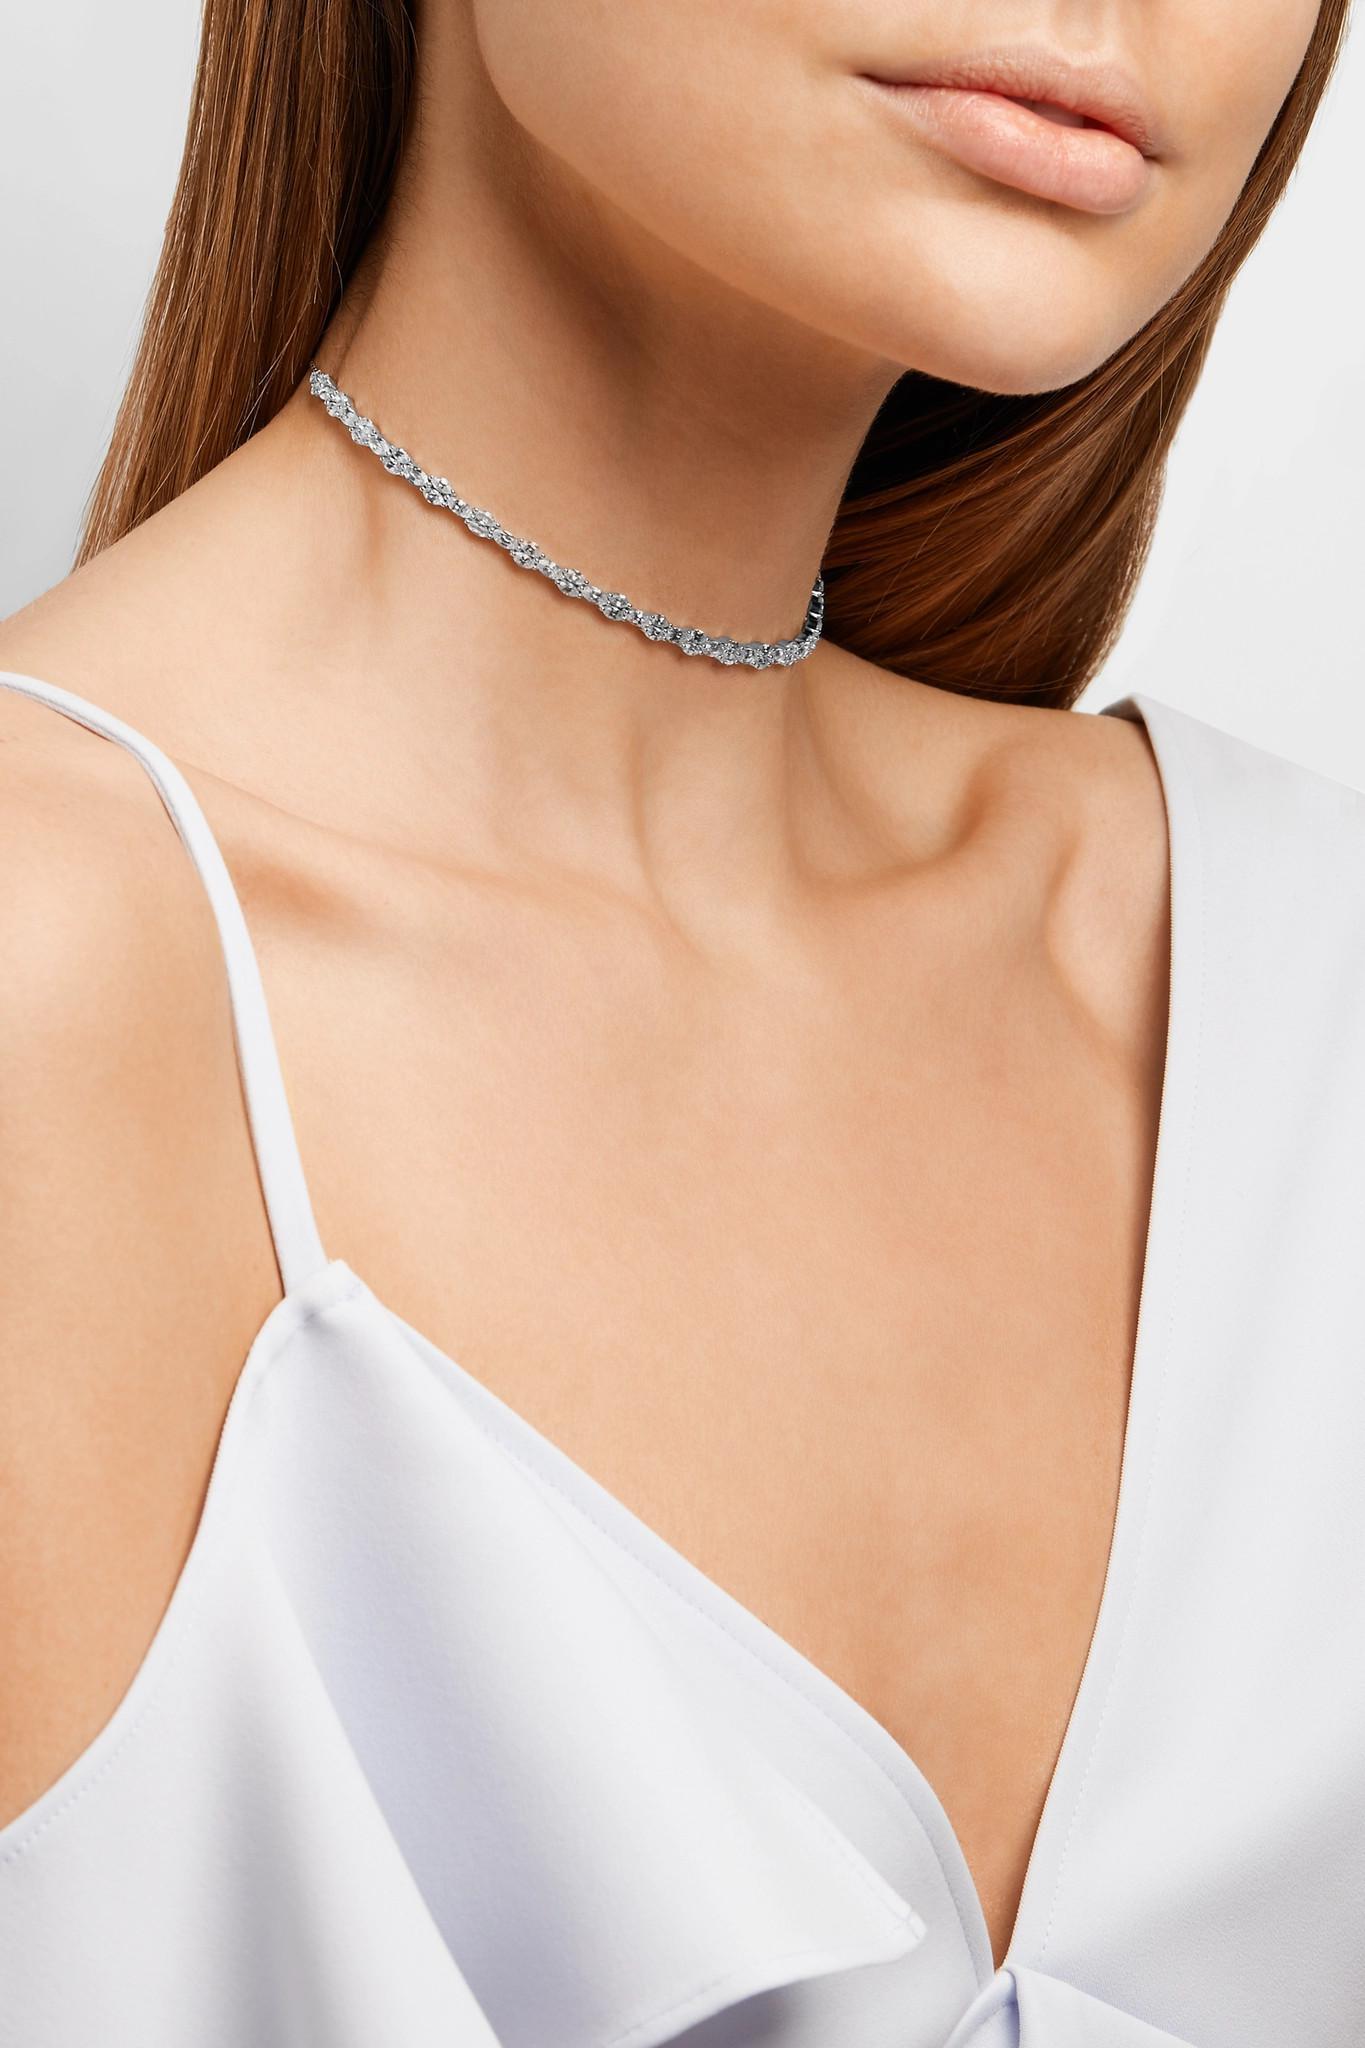 Anissa Kermiche Riviera 18-karat White Gold, Sapphire And Mother-of-pearl Choker